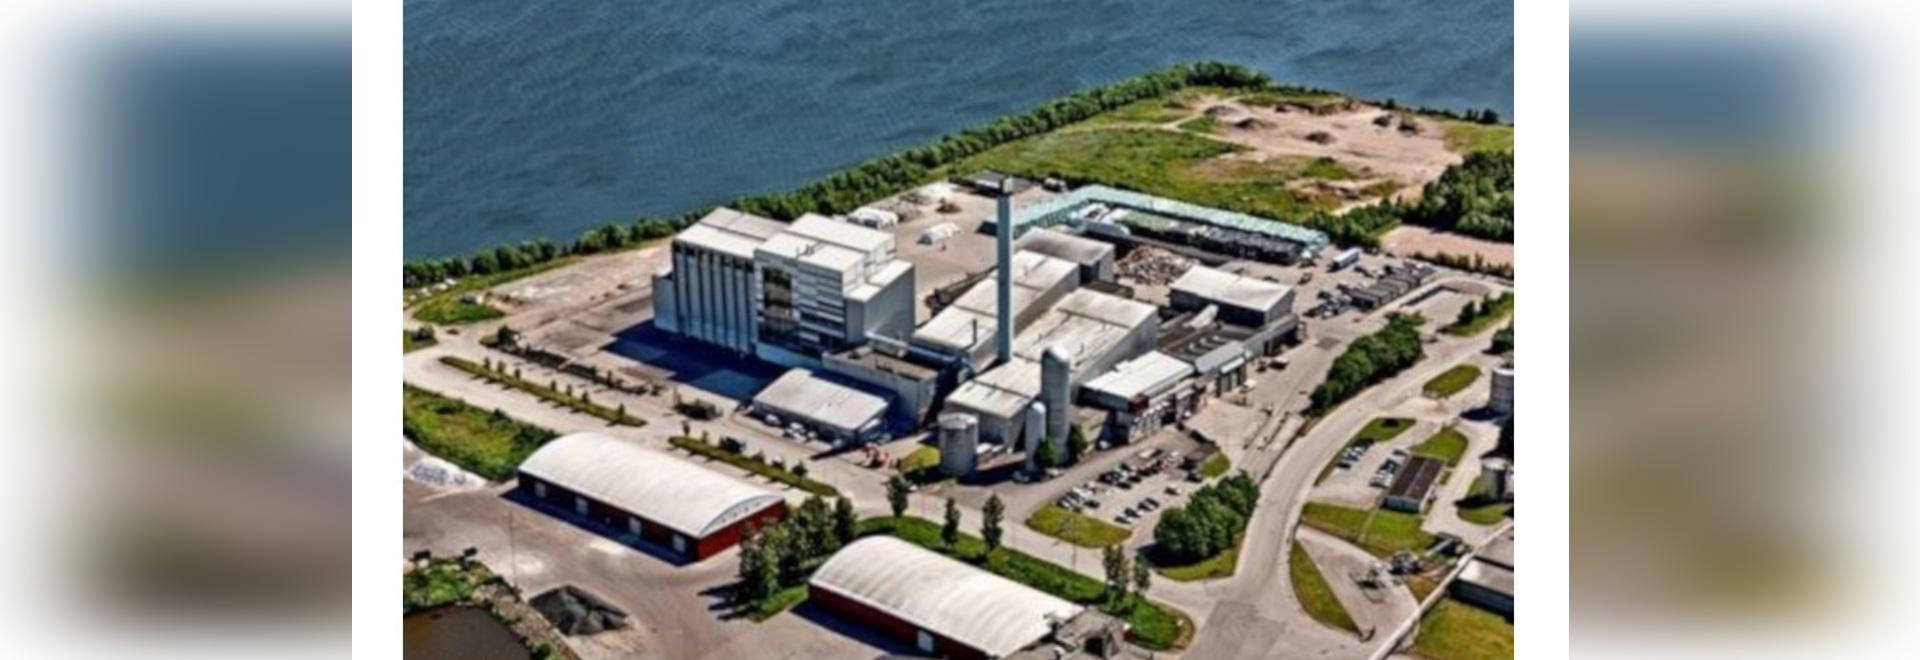 Kessel wandelt Abfall in Industriedampf, Elektrizität um